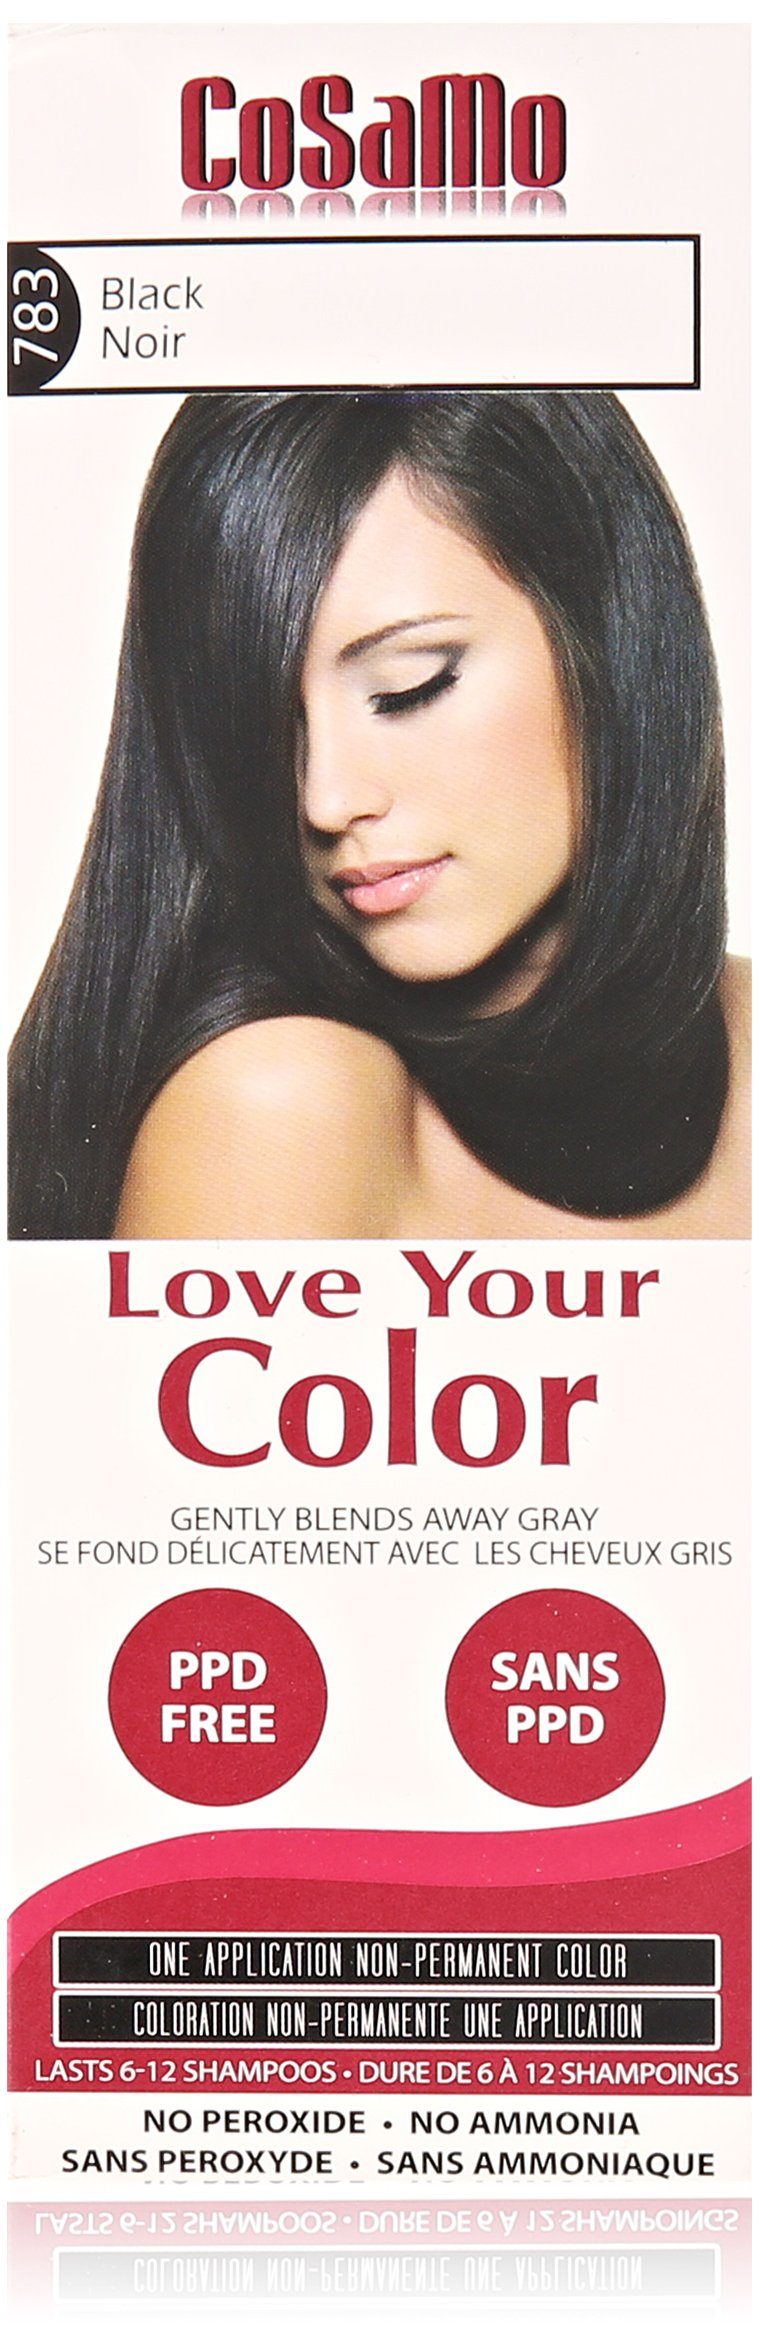 Amazon Cosamo Love Your Color Ammonia Peroxide Free Hair